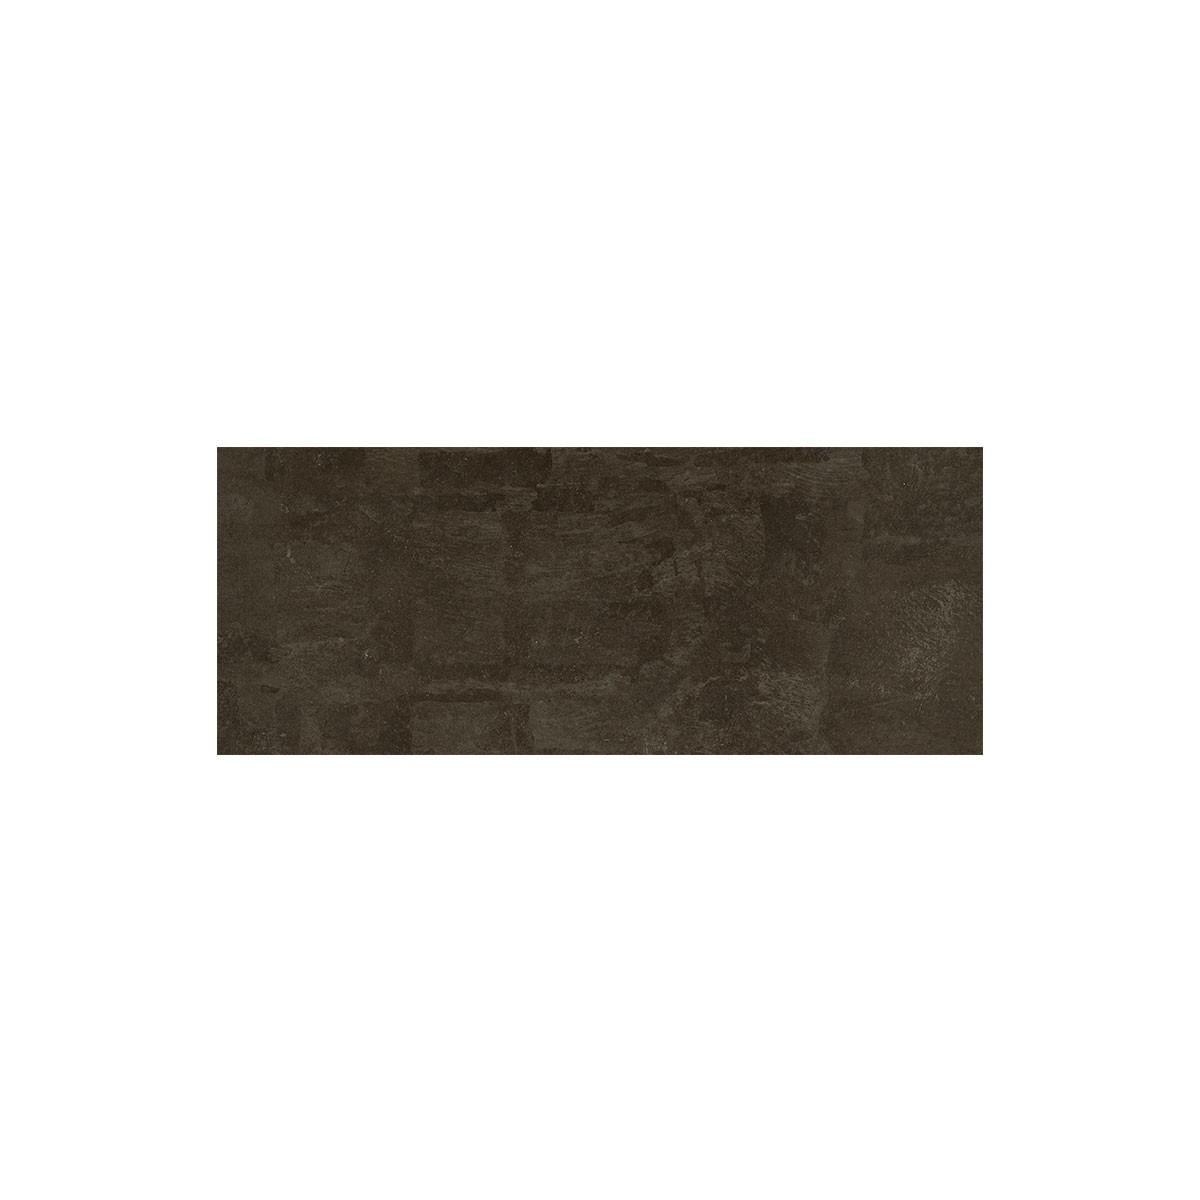 DECORAPORT NSM Panneau Mural, Gris Vieilli,3.97'' x7.85'' (NAG-01) (Échantillon)